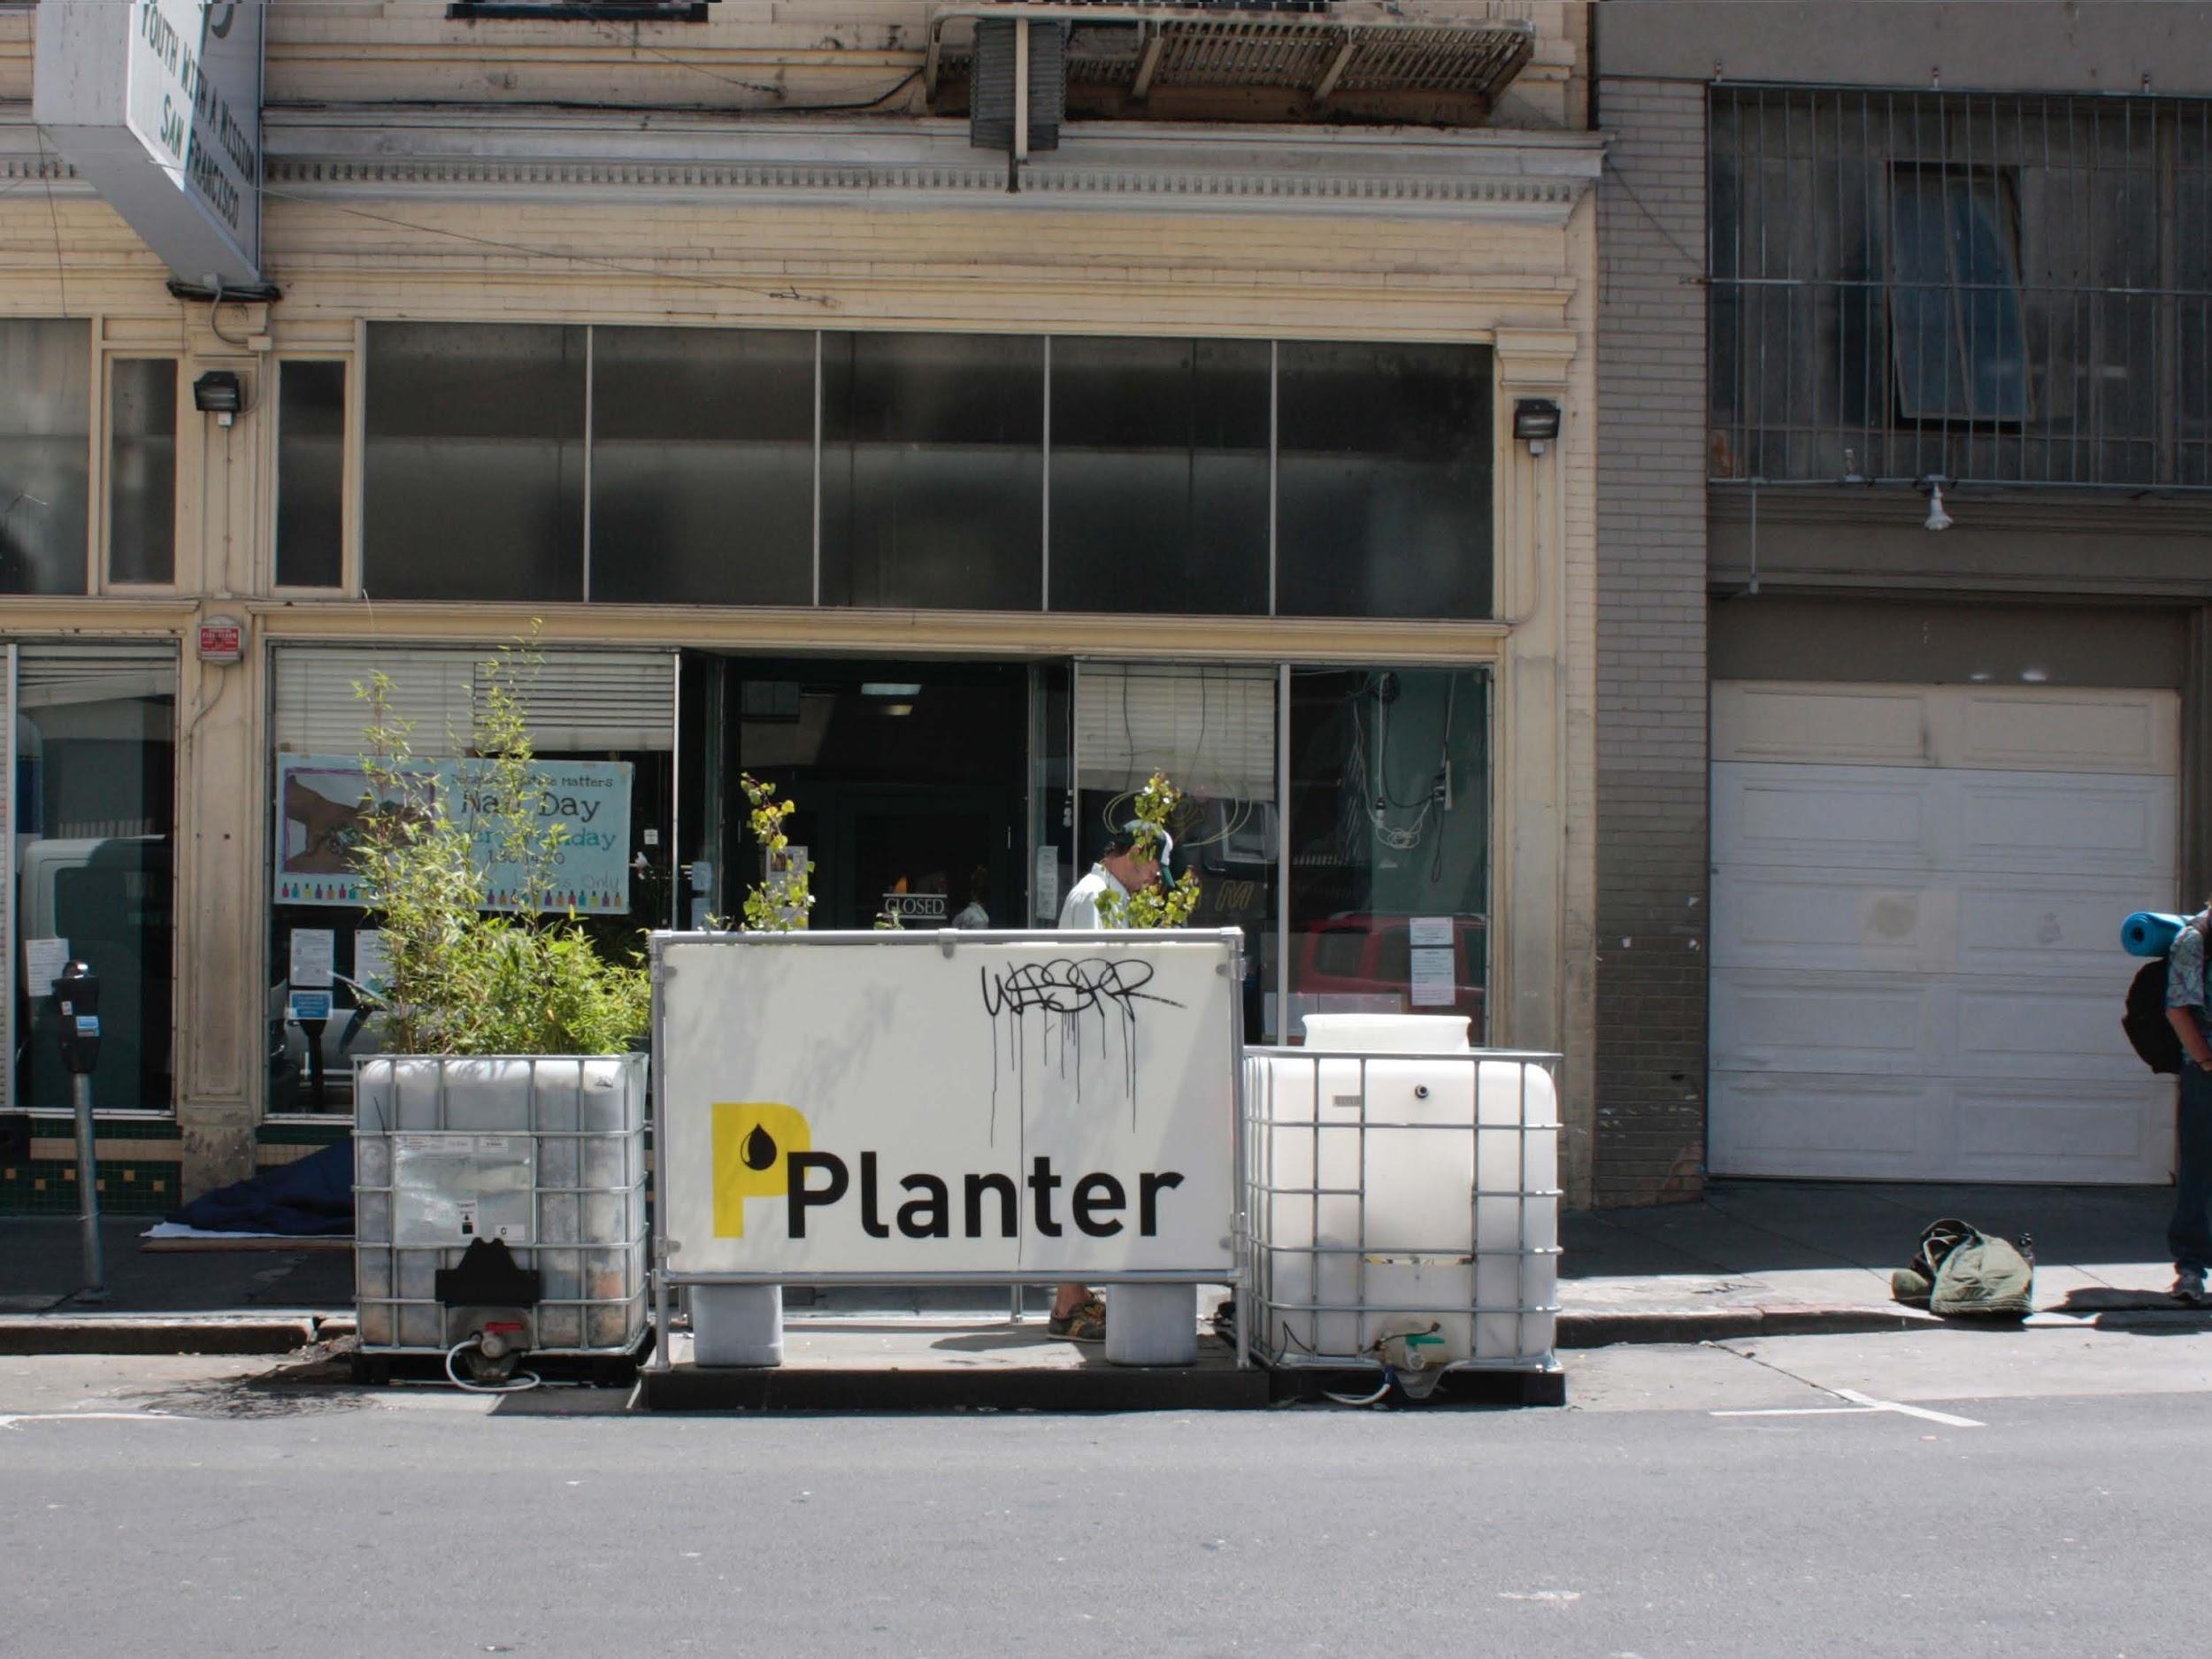 PPlanter 1.0